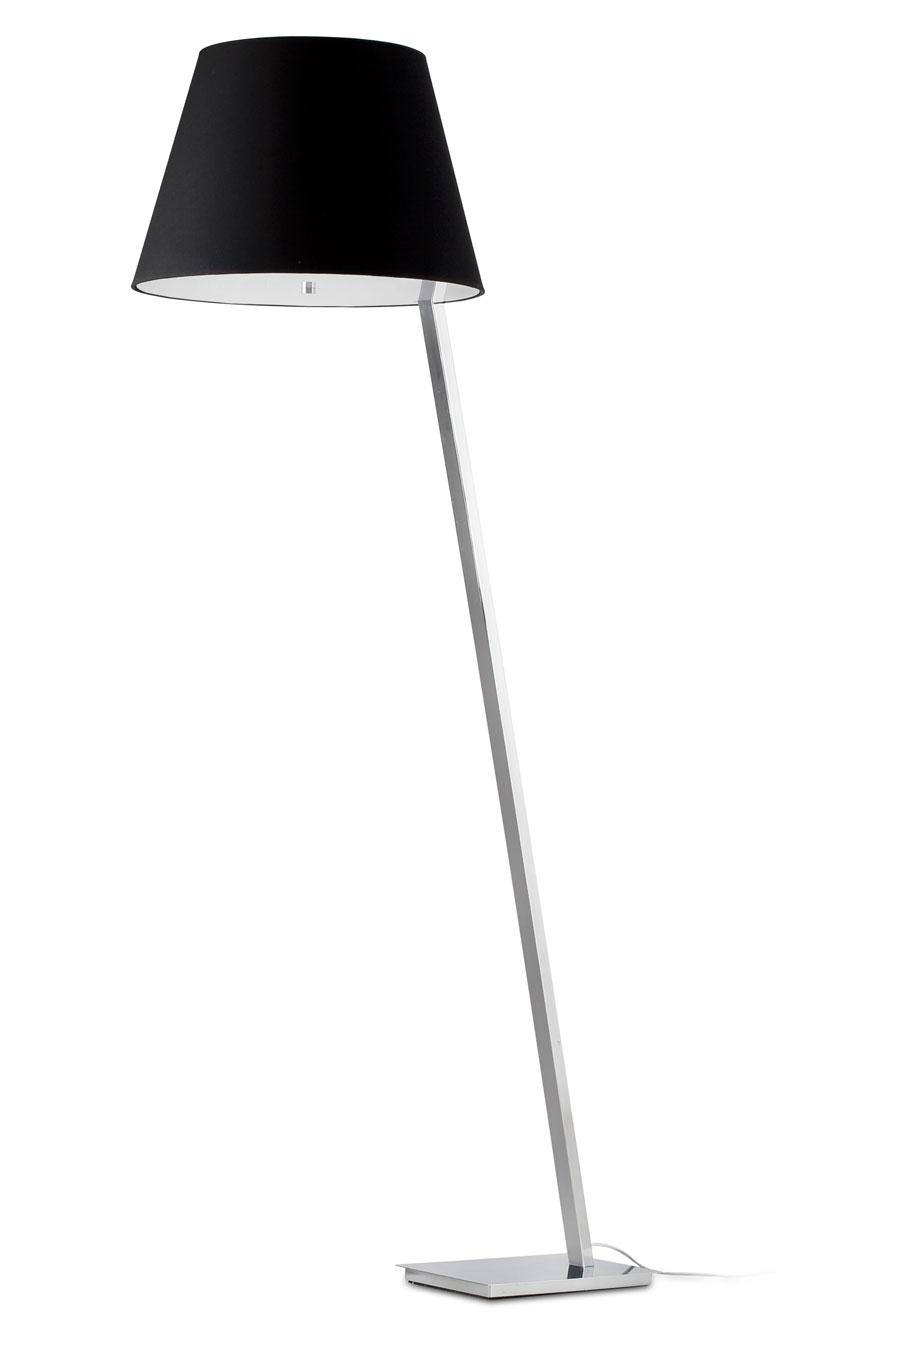 moma lampadaire design chrome et tissu noir faro style design et contemporain lampadaire. Black Bedroom Furniture Sets. Home Design Ideas